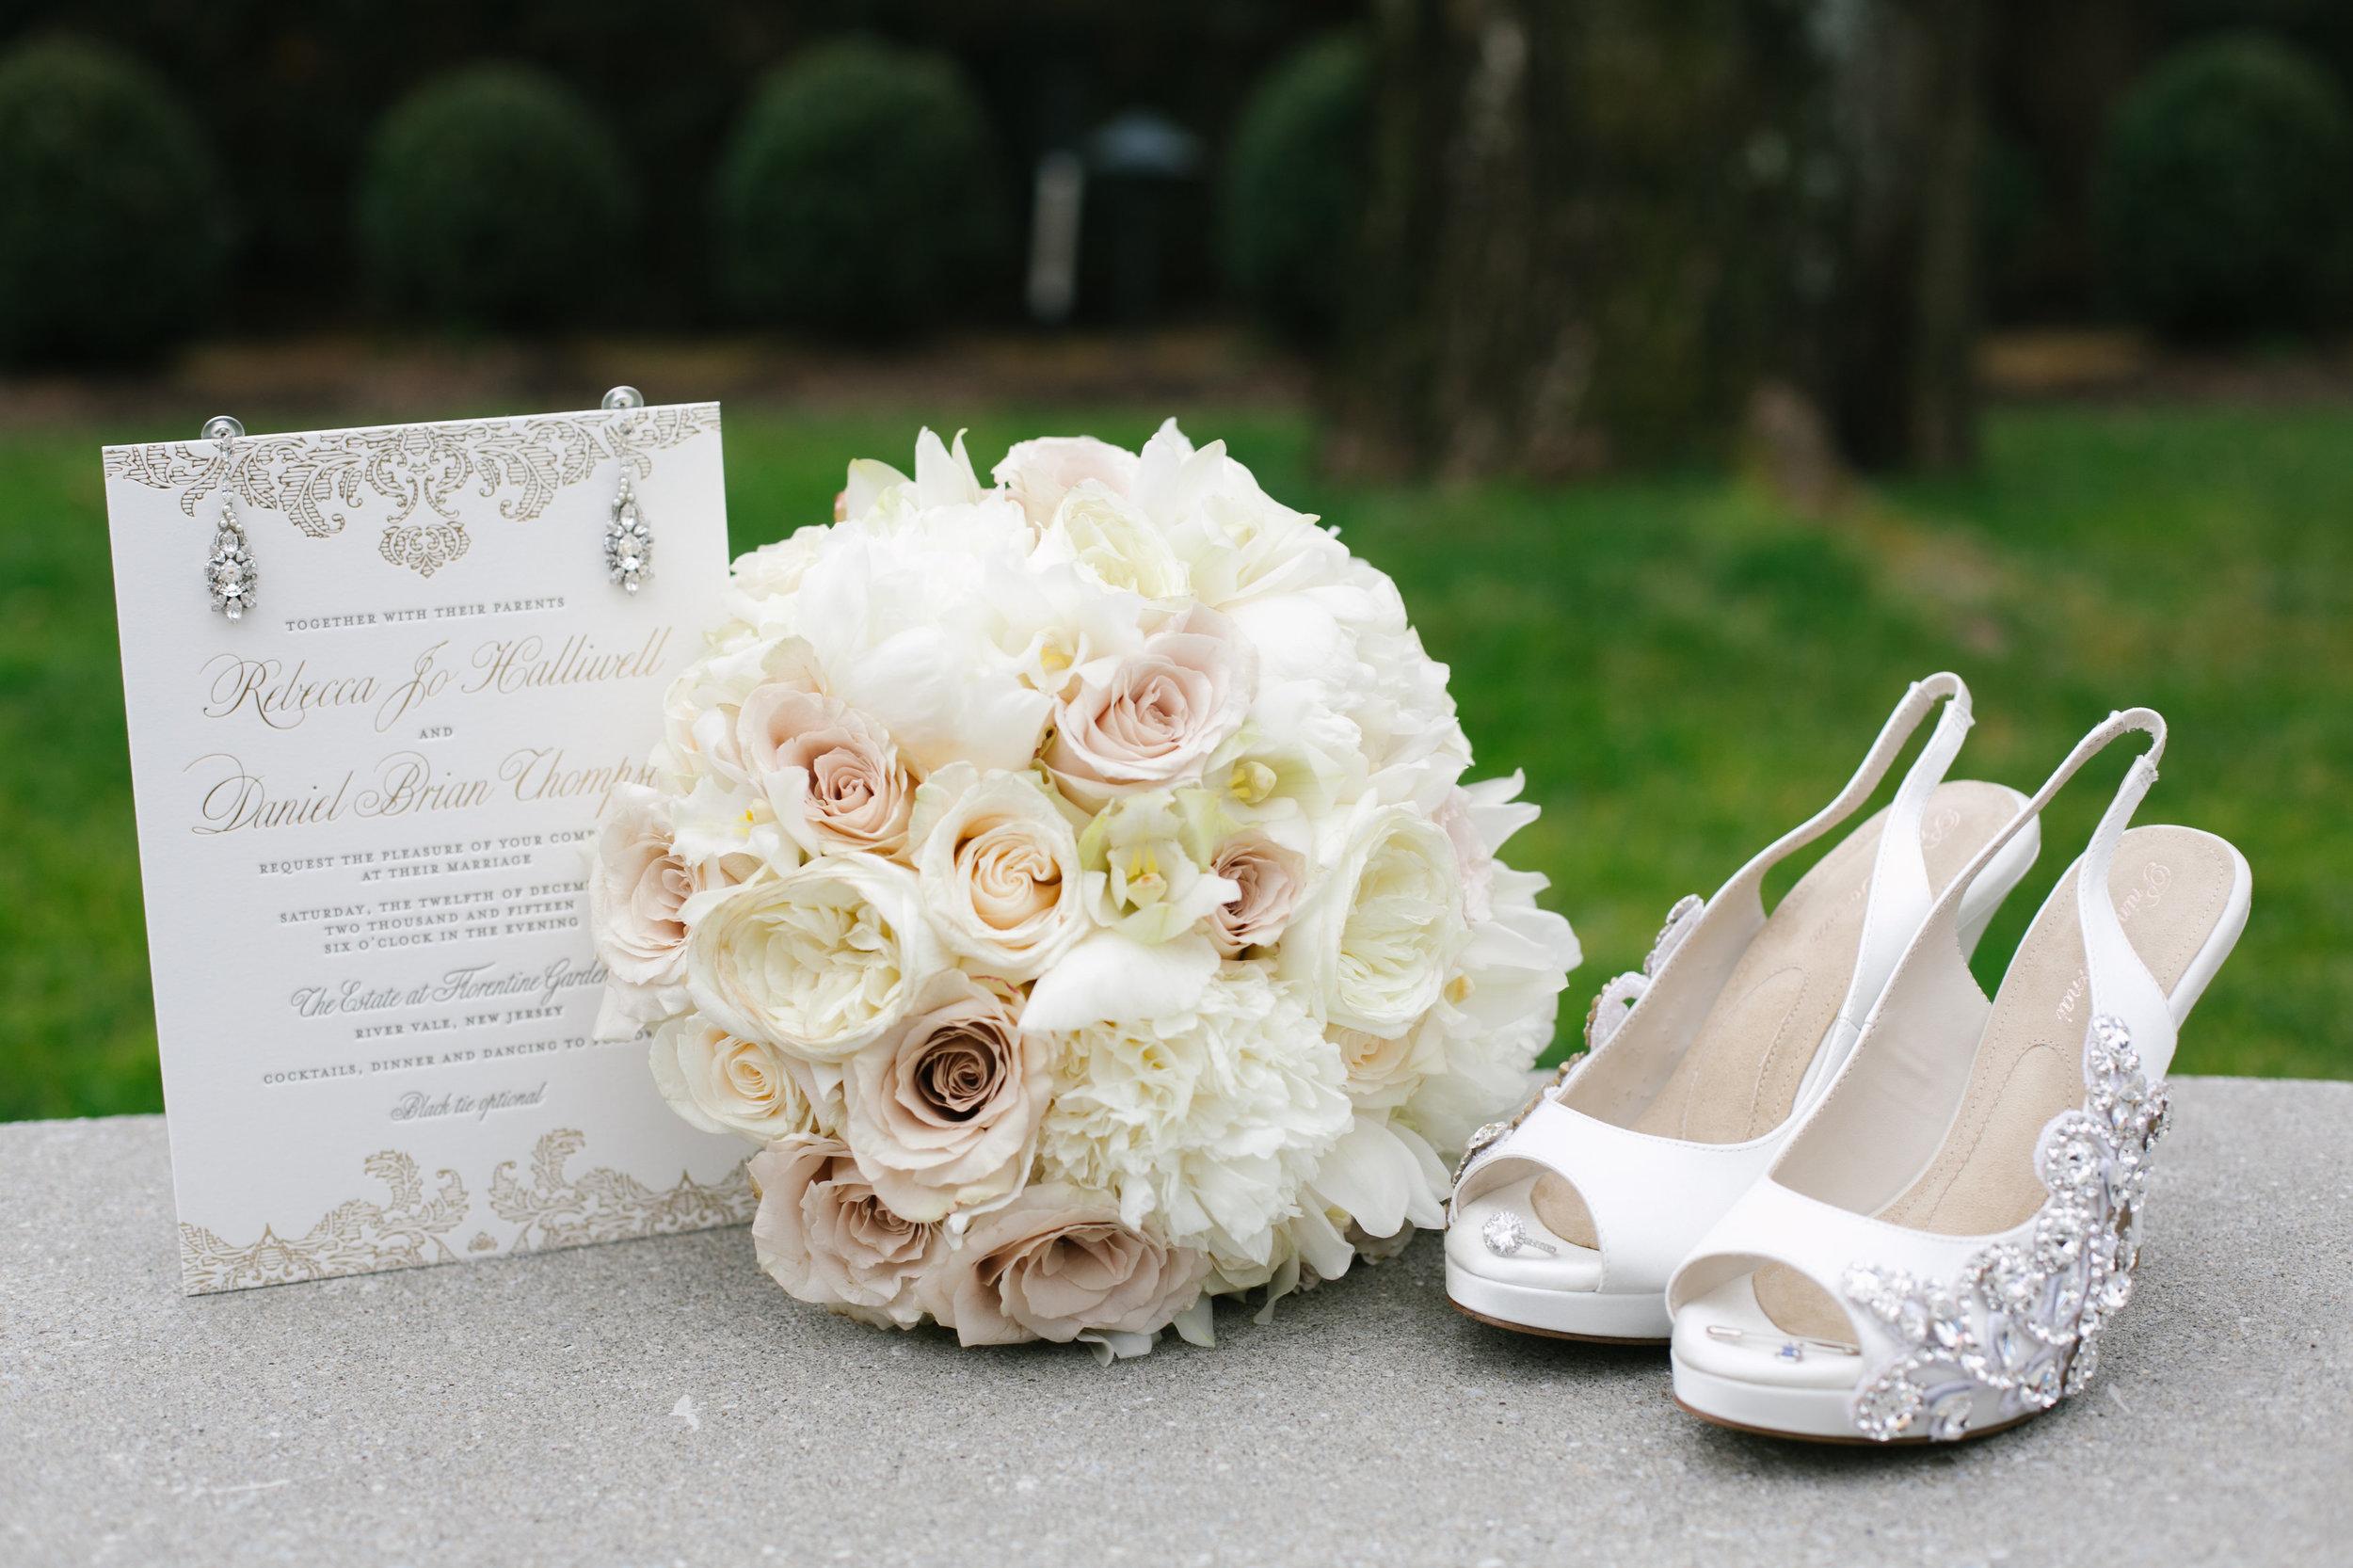 Ceci_New_York_Custom_Invitation_ New_Jersey_Wedding_Luxury_Personalized_Ceci_Style_Bride_Foil_Stamping6.jpg